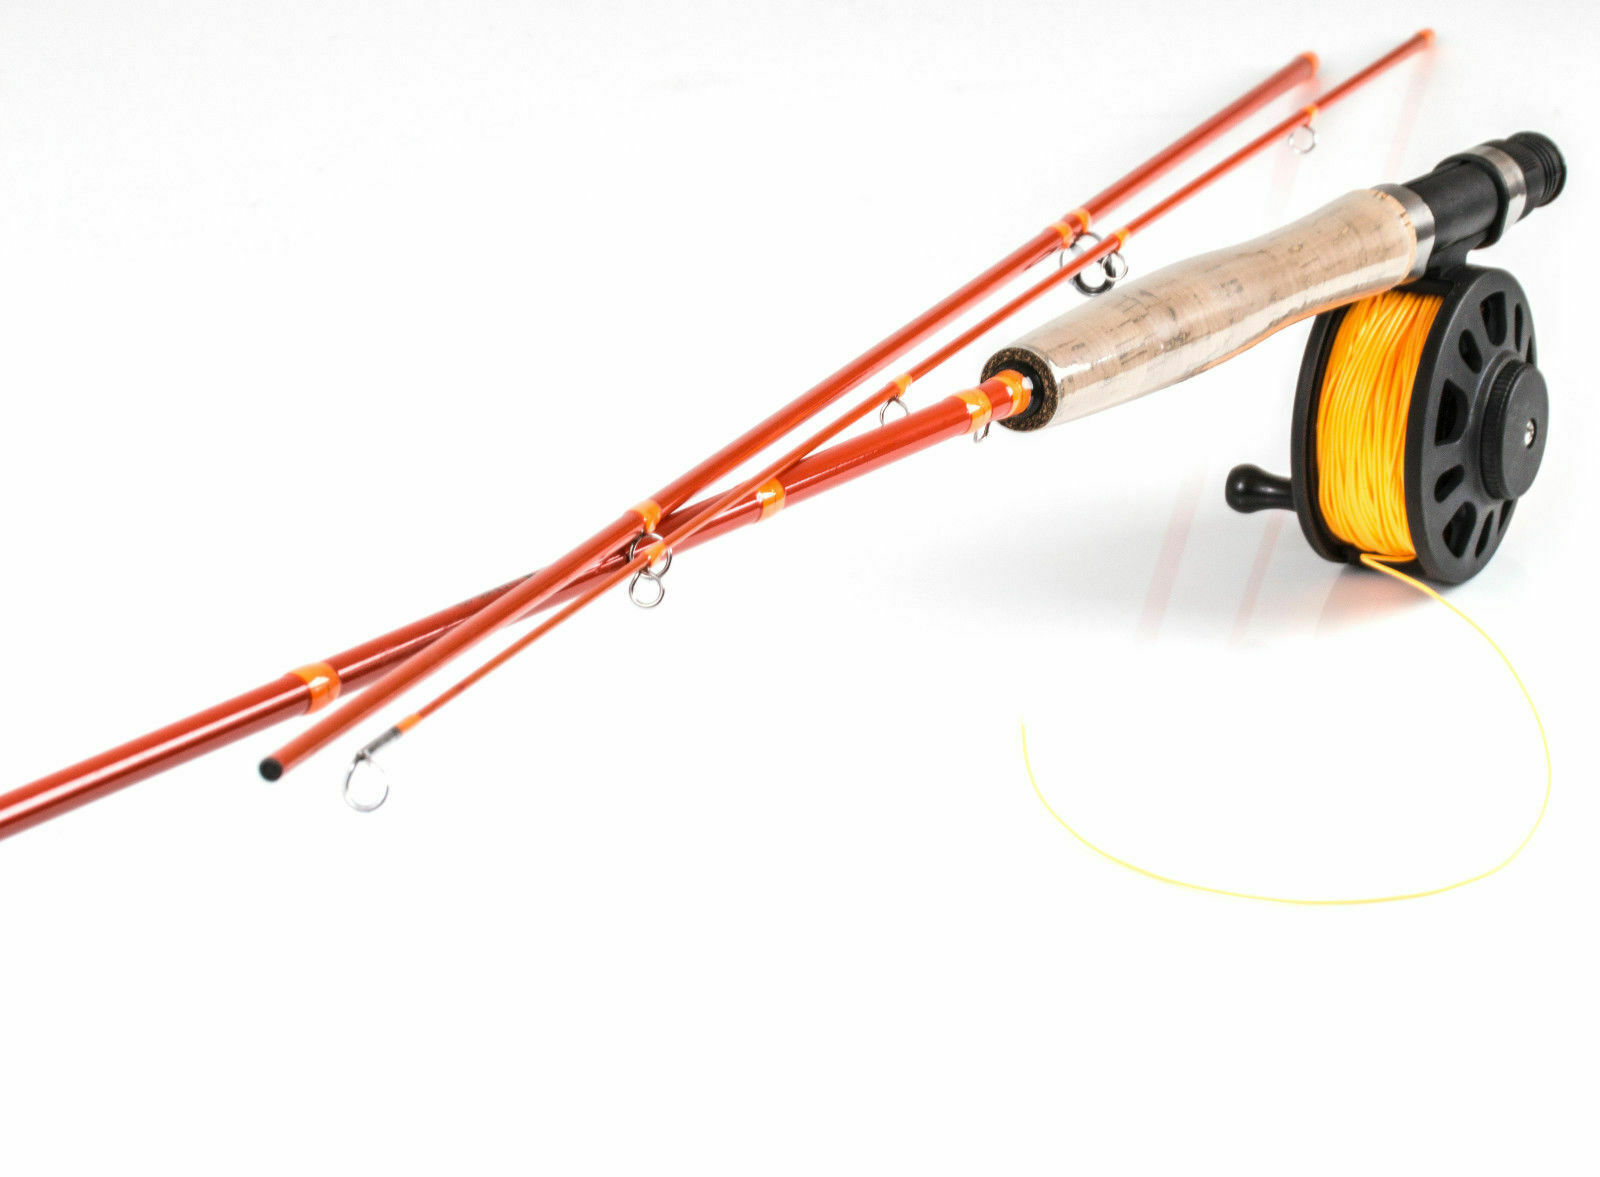 FLY Fishing RodFladen Warbird Pesca A Mosca Combo Set WF 6AFFARE